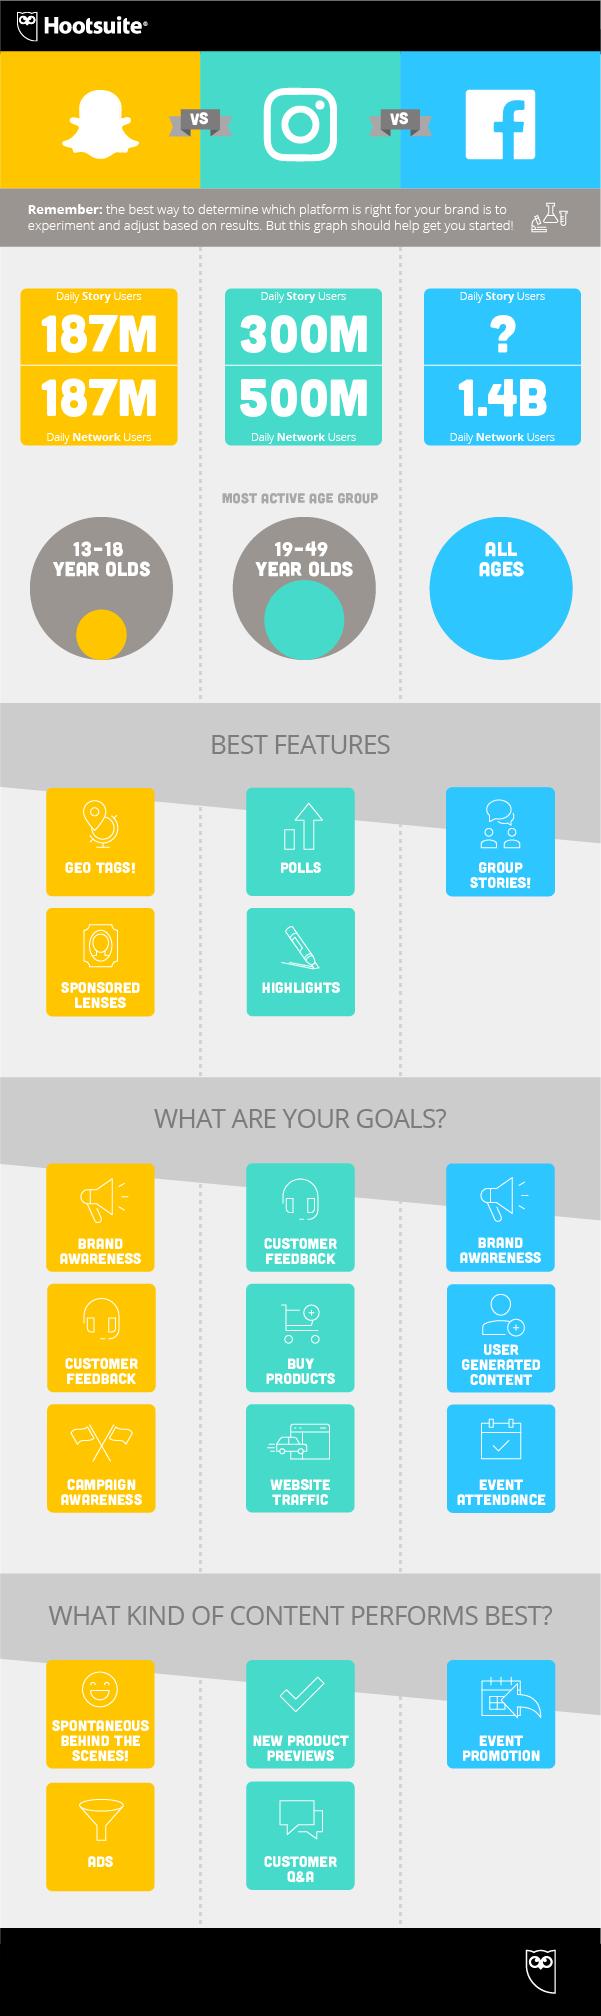 Hoot_Stories_infographic